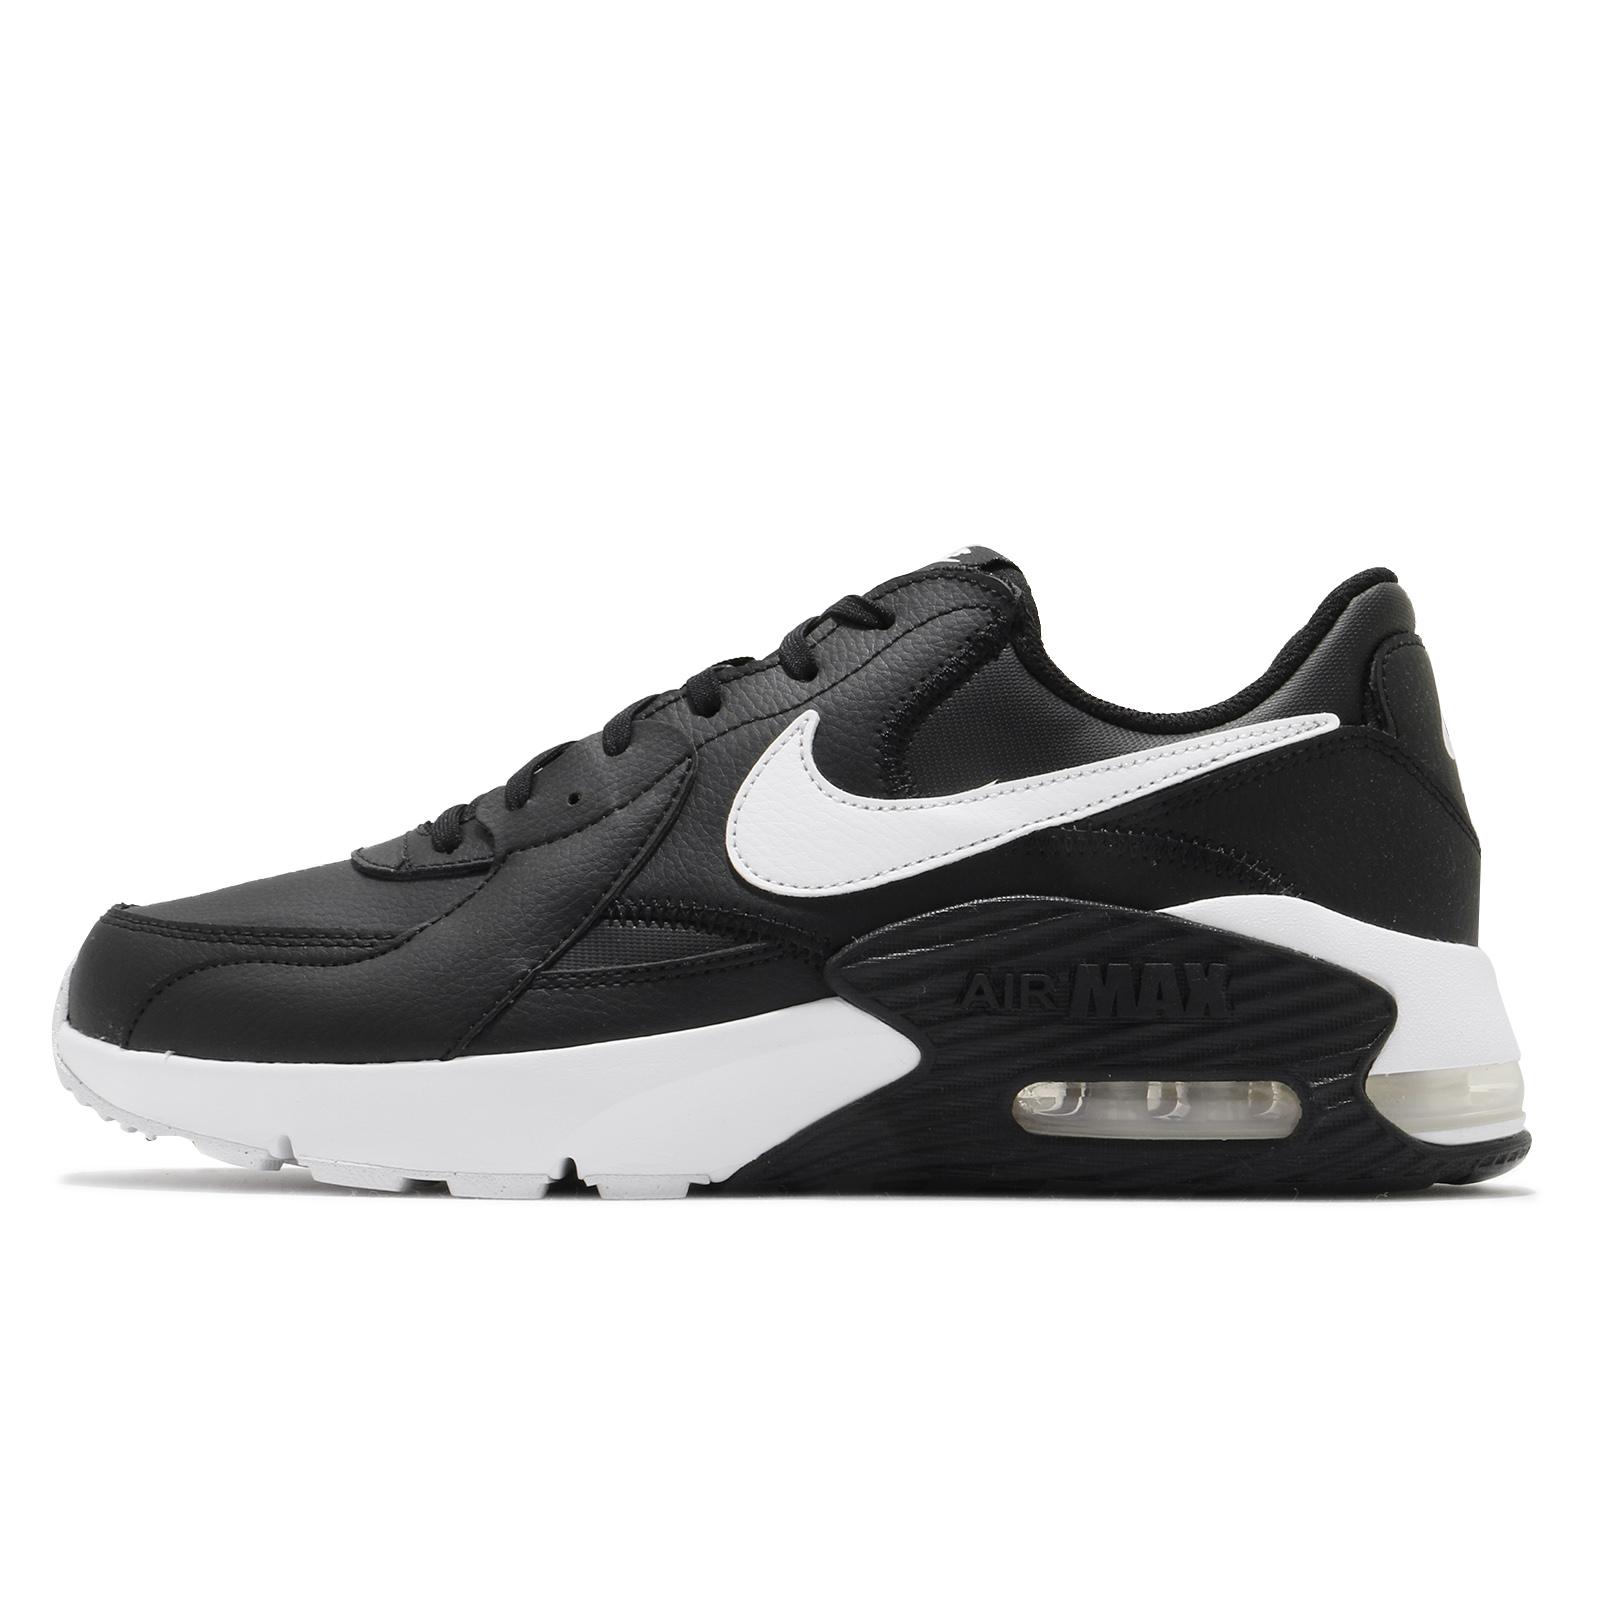 Nike 休閒鞋 Air Max Excee Leather 黑白 氣墊 皮革 男鞋 【ACS】 DB2839-002